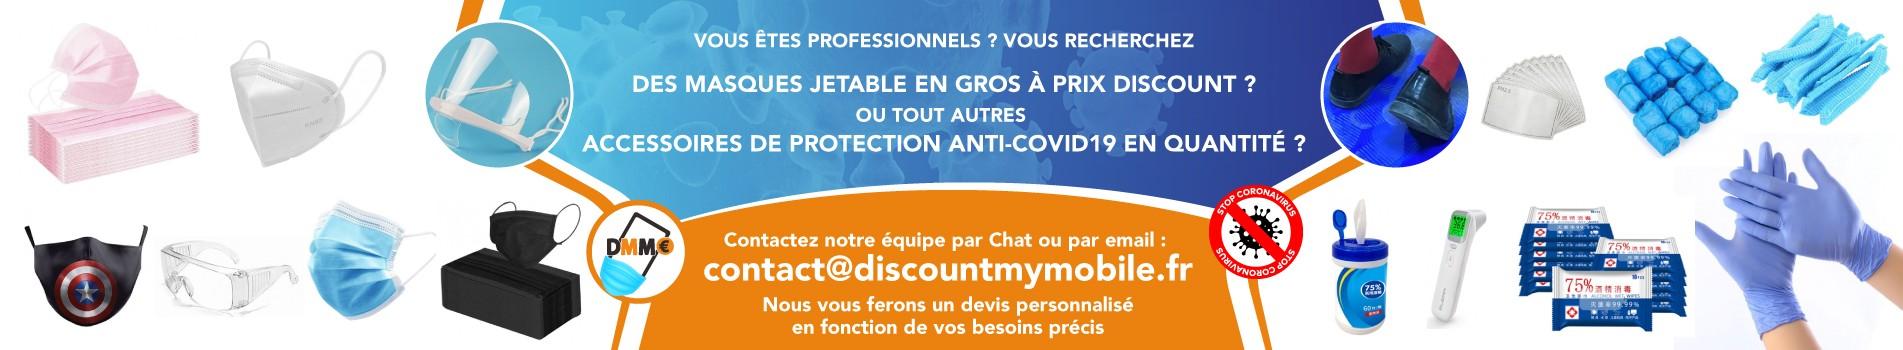 Masque de protections Covid19